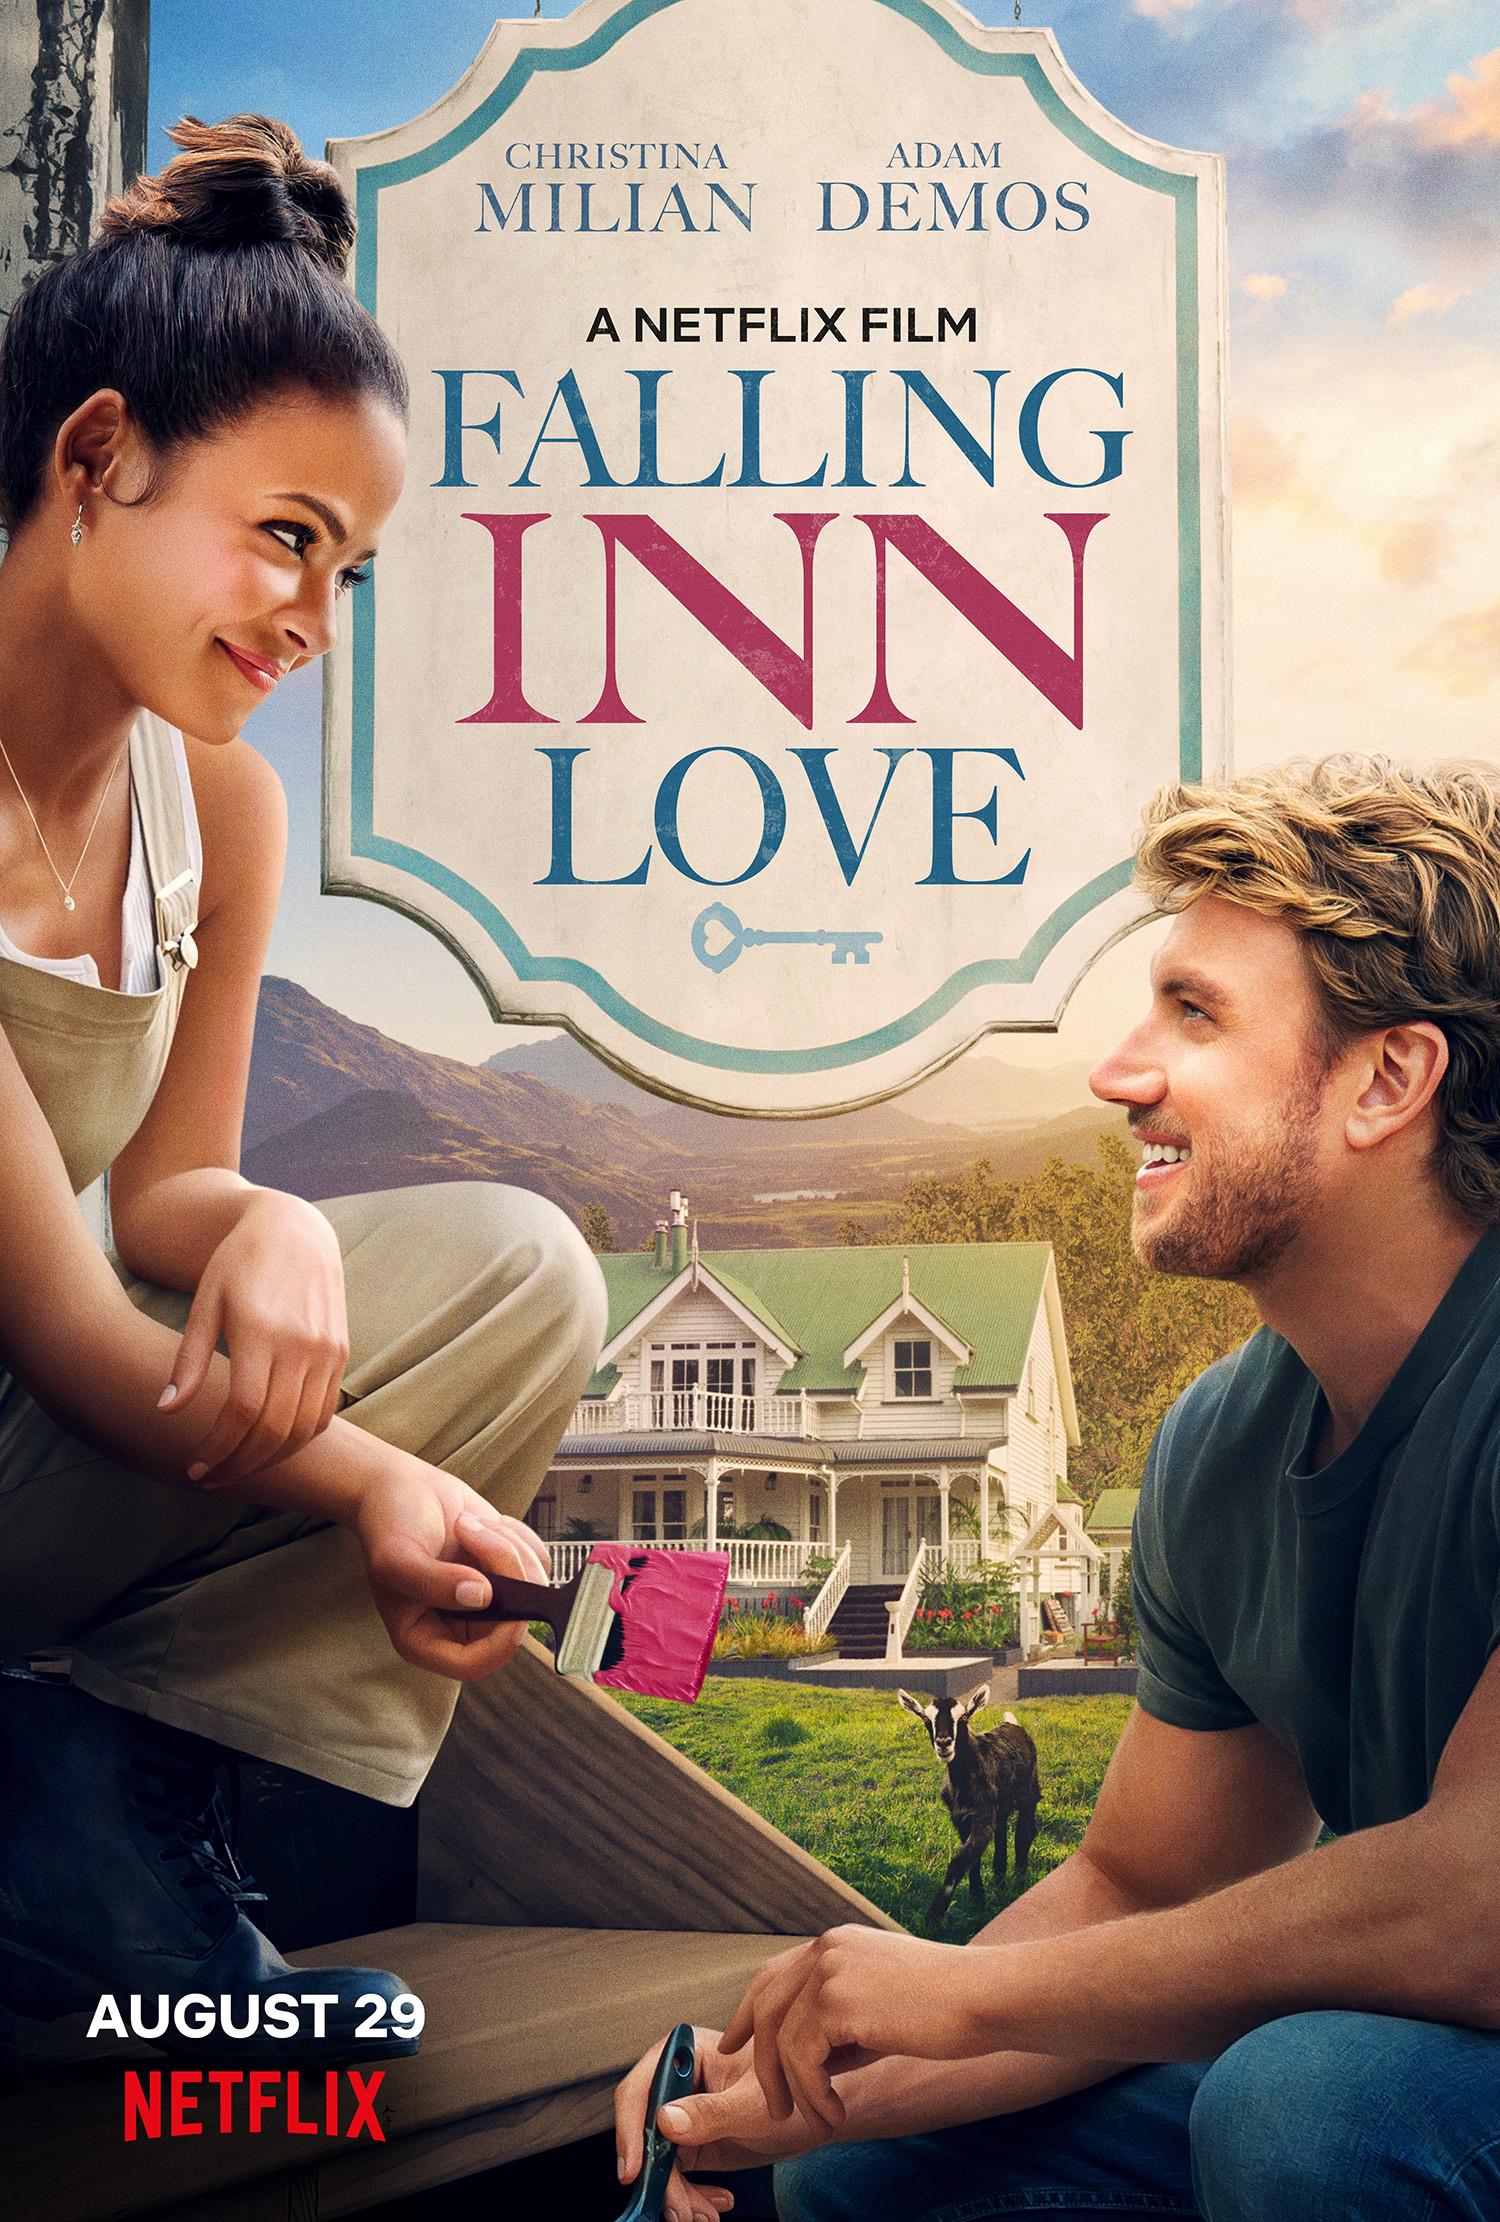 New Movie: Falling Inn Love